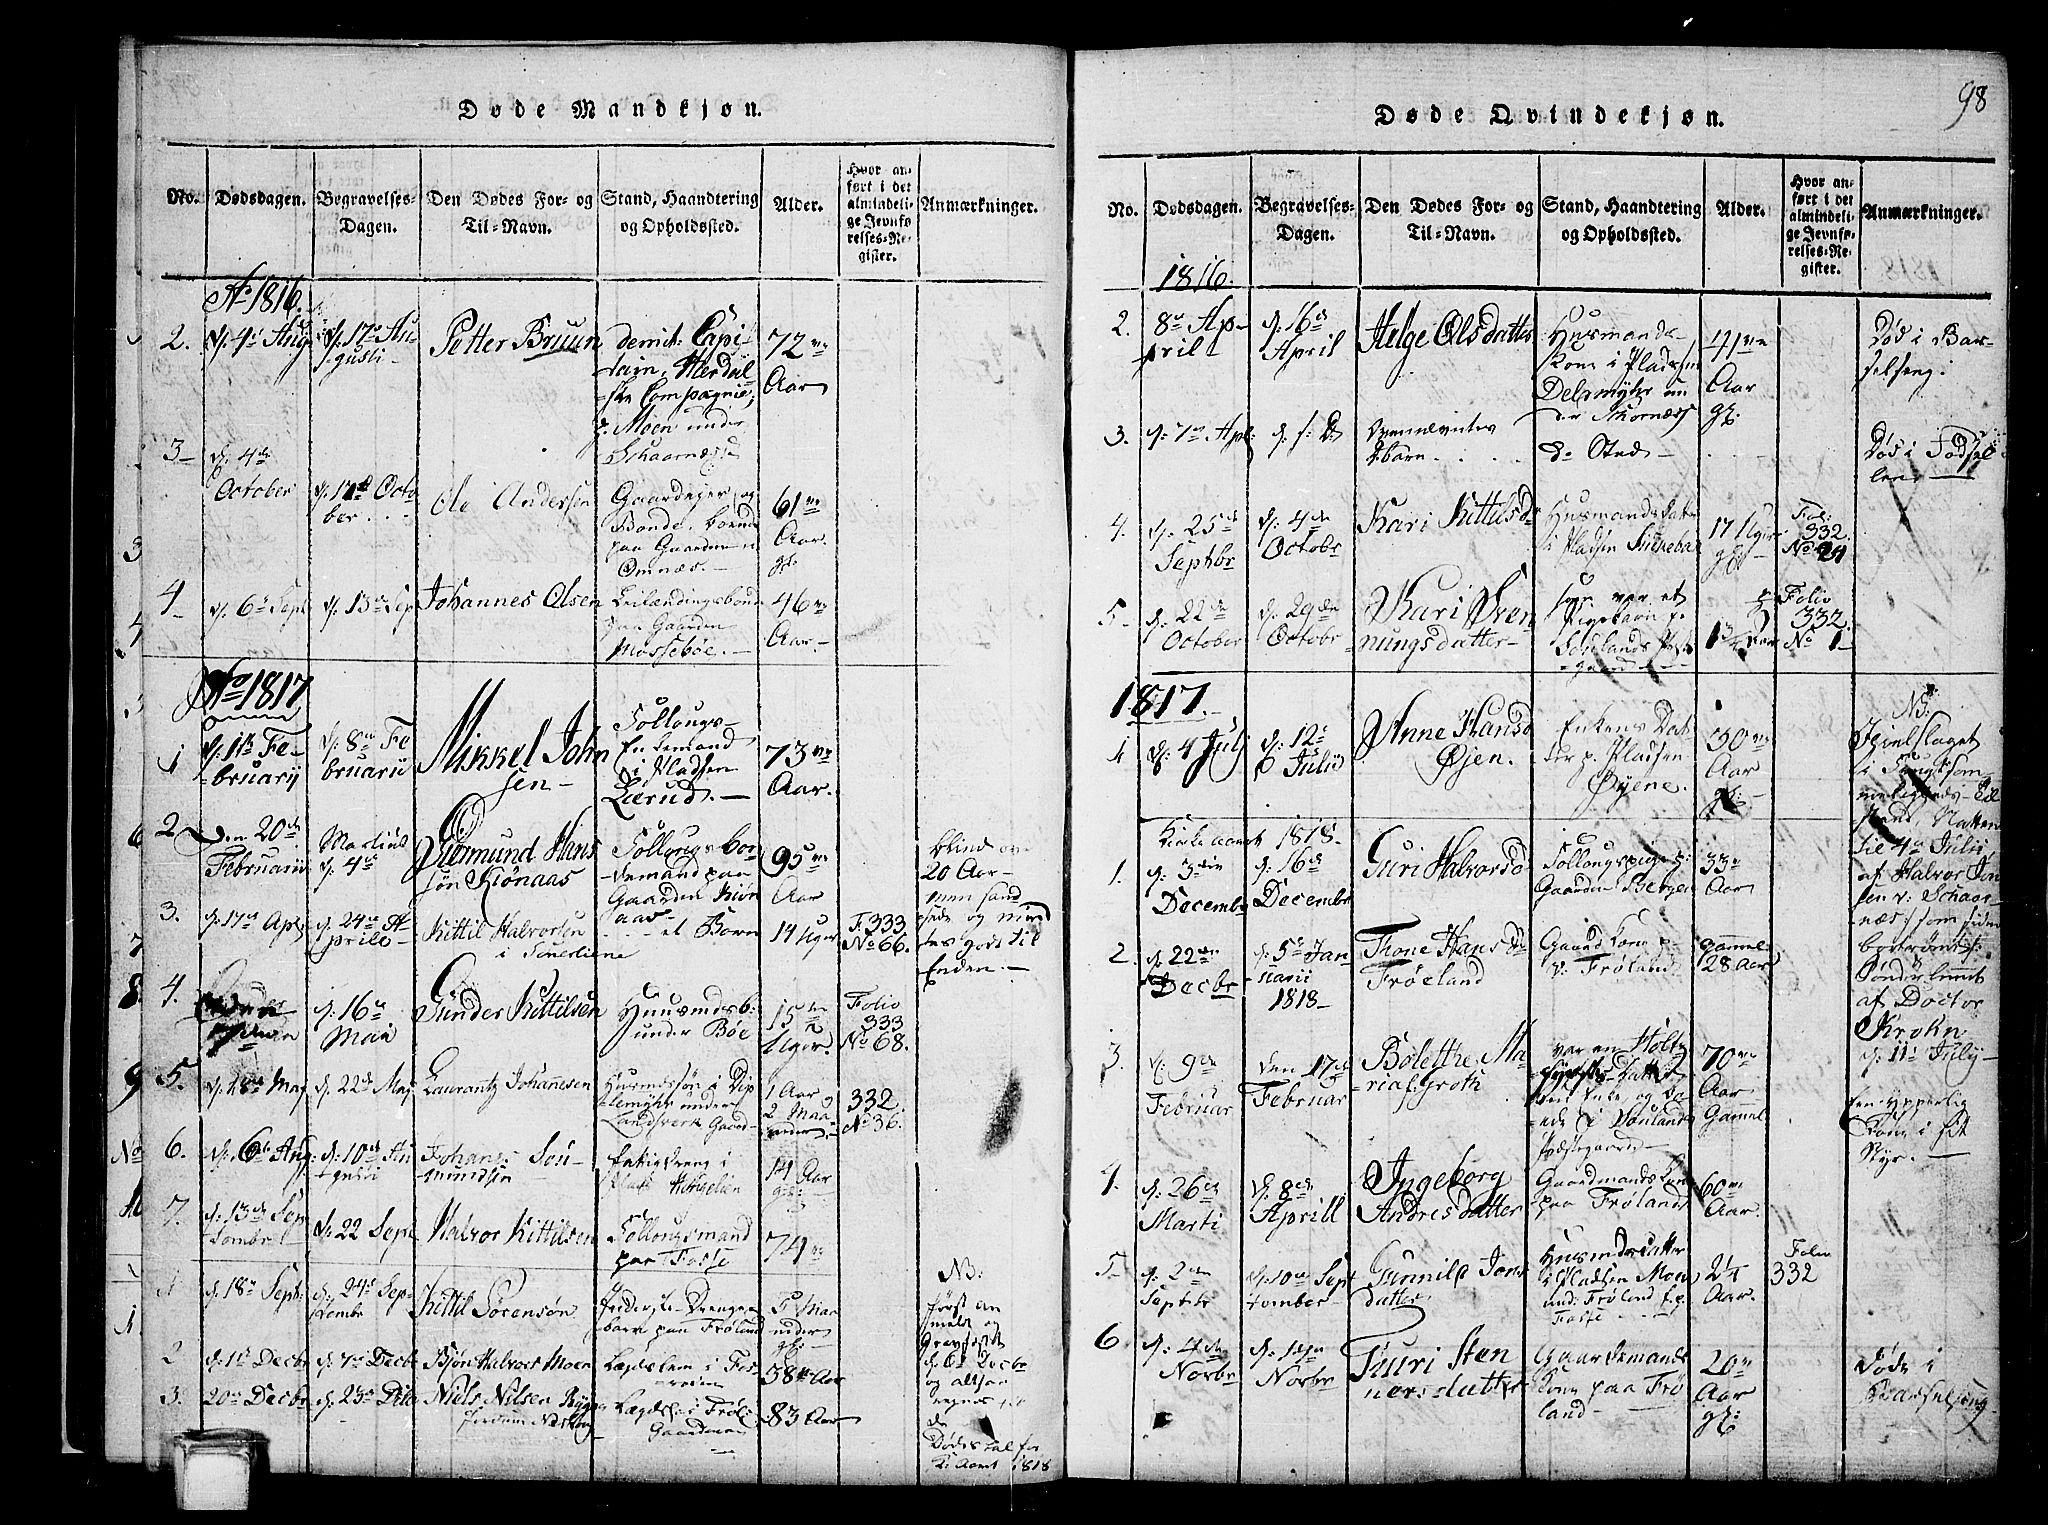 SAKO, Hjartdal kirkebøker, G/Gb/L0001: Klokkerbok nr. II 1, 1815-1842, s. 98